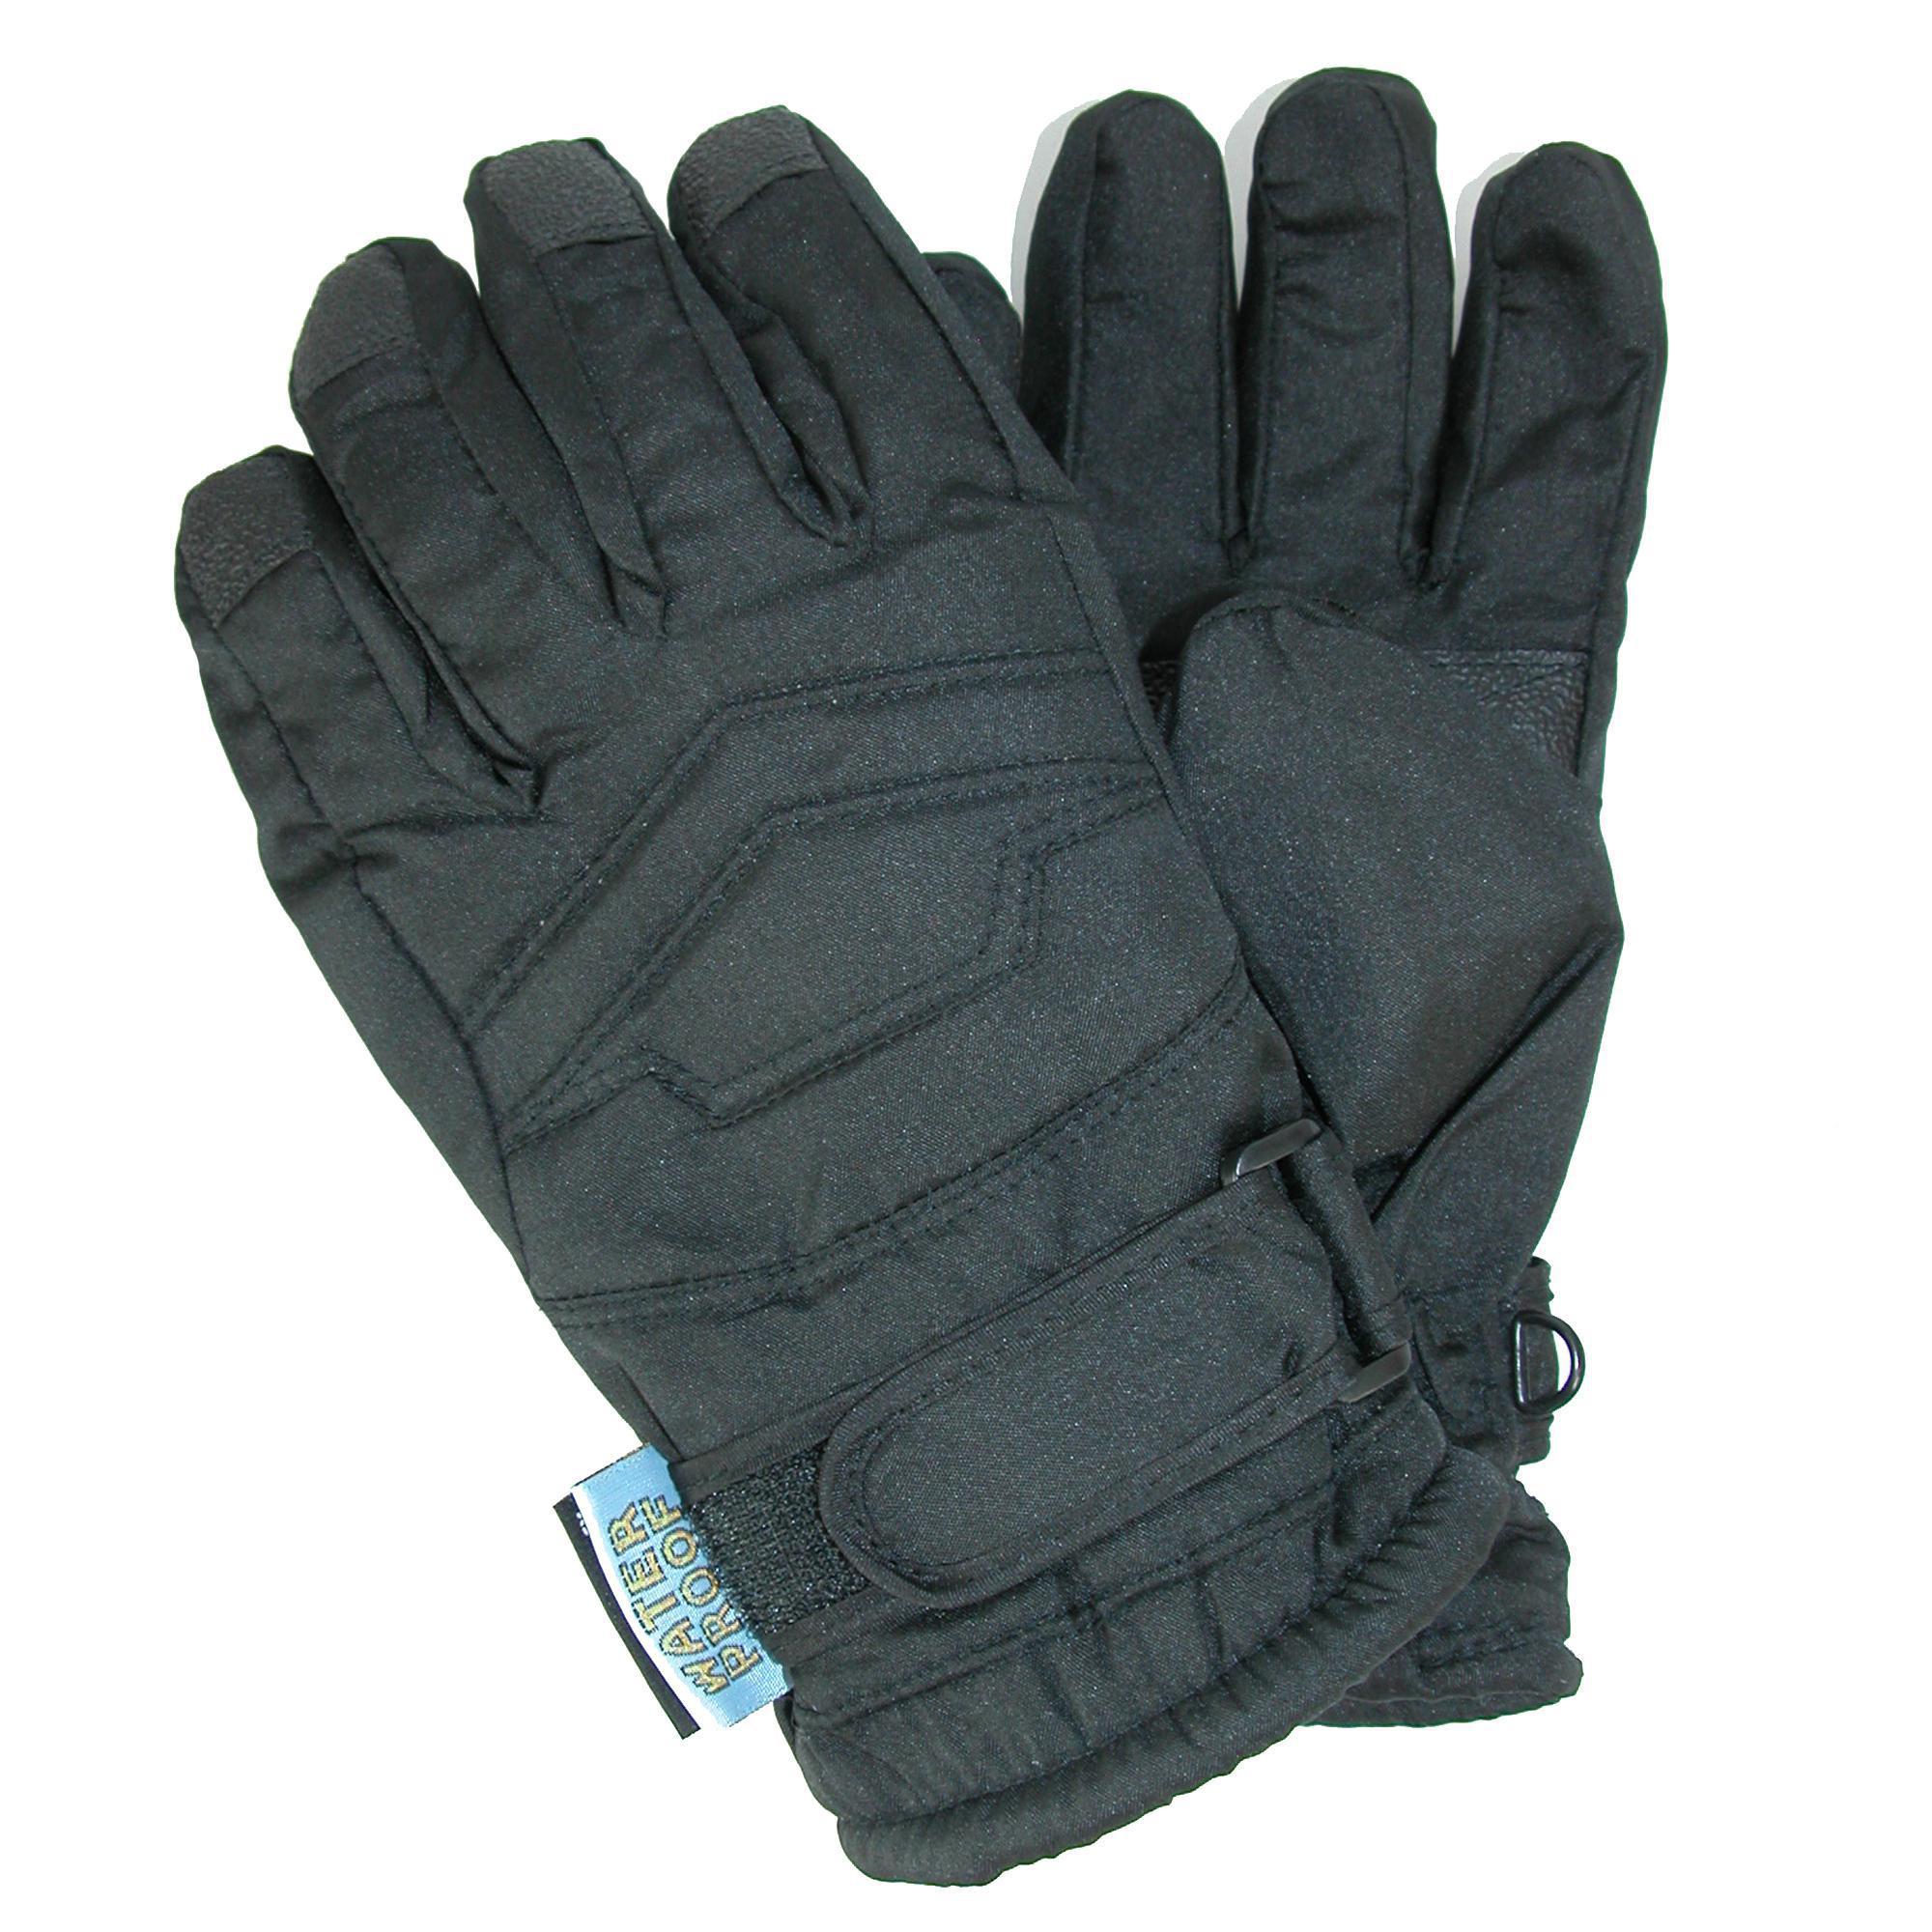 CTM Kids' Thinsulate Lined Waterproof Winter Gloves